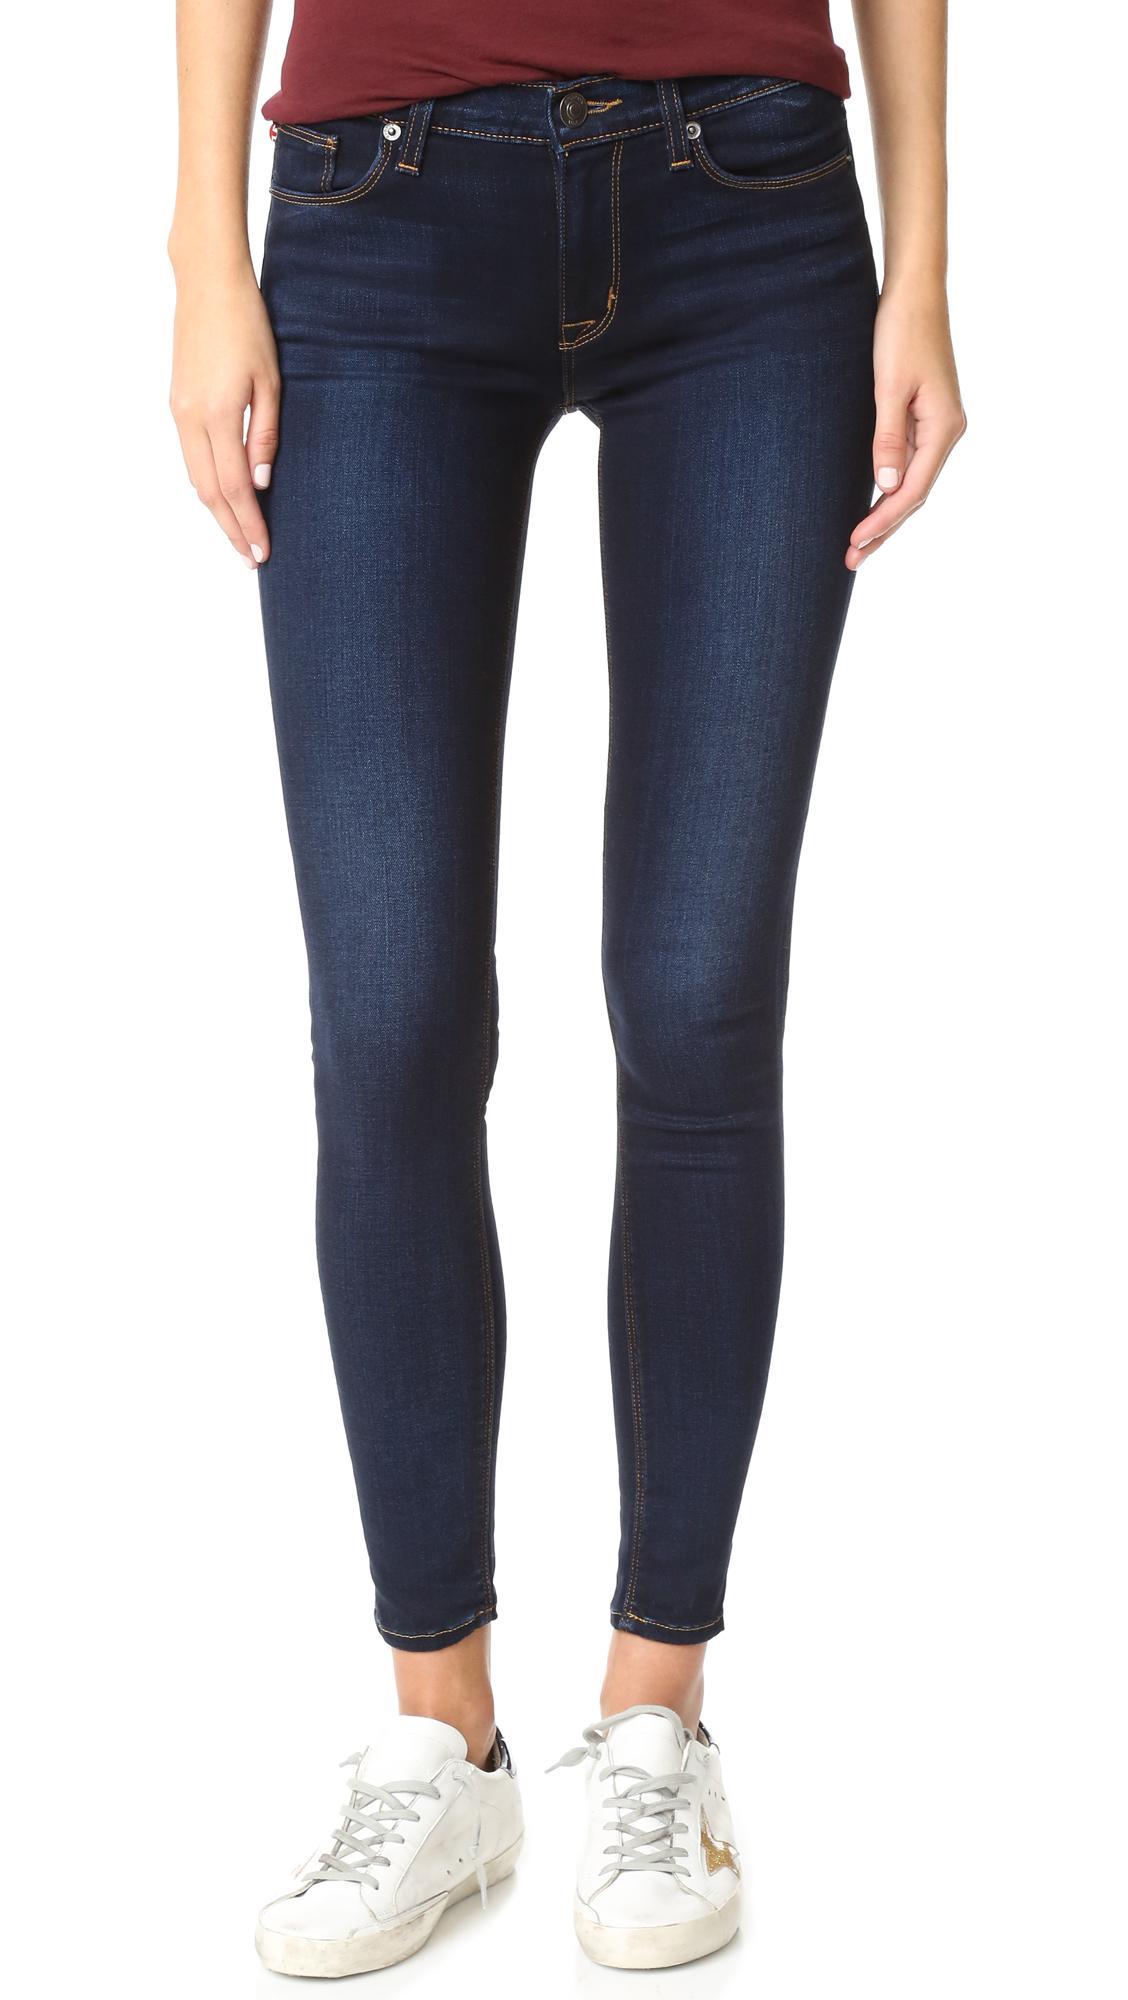 Hudson Nico Super Skinny Jeans - Oracle at Shopbop